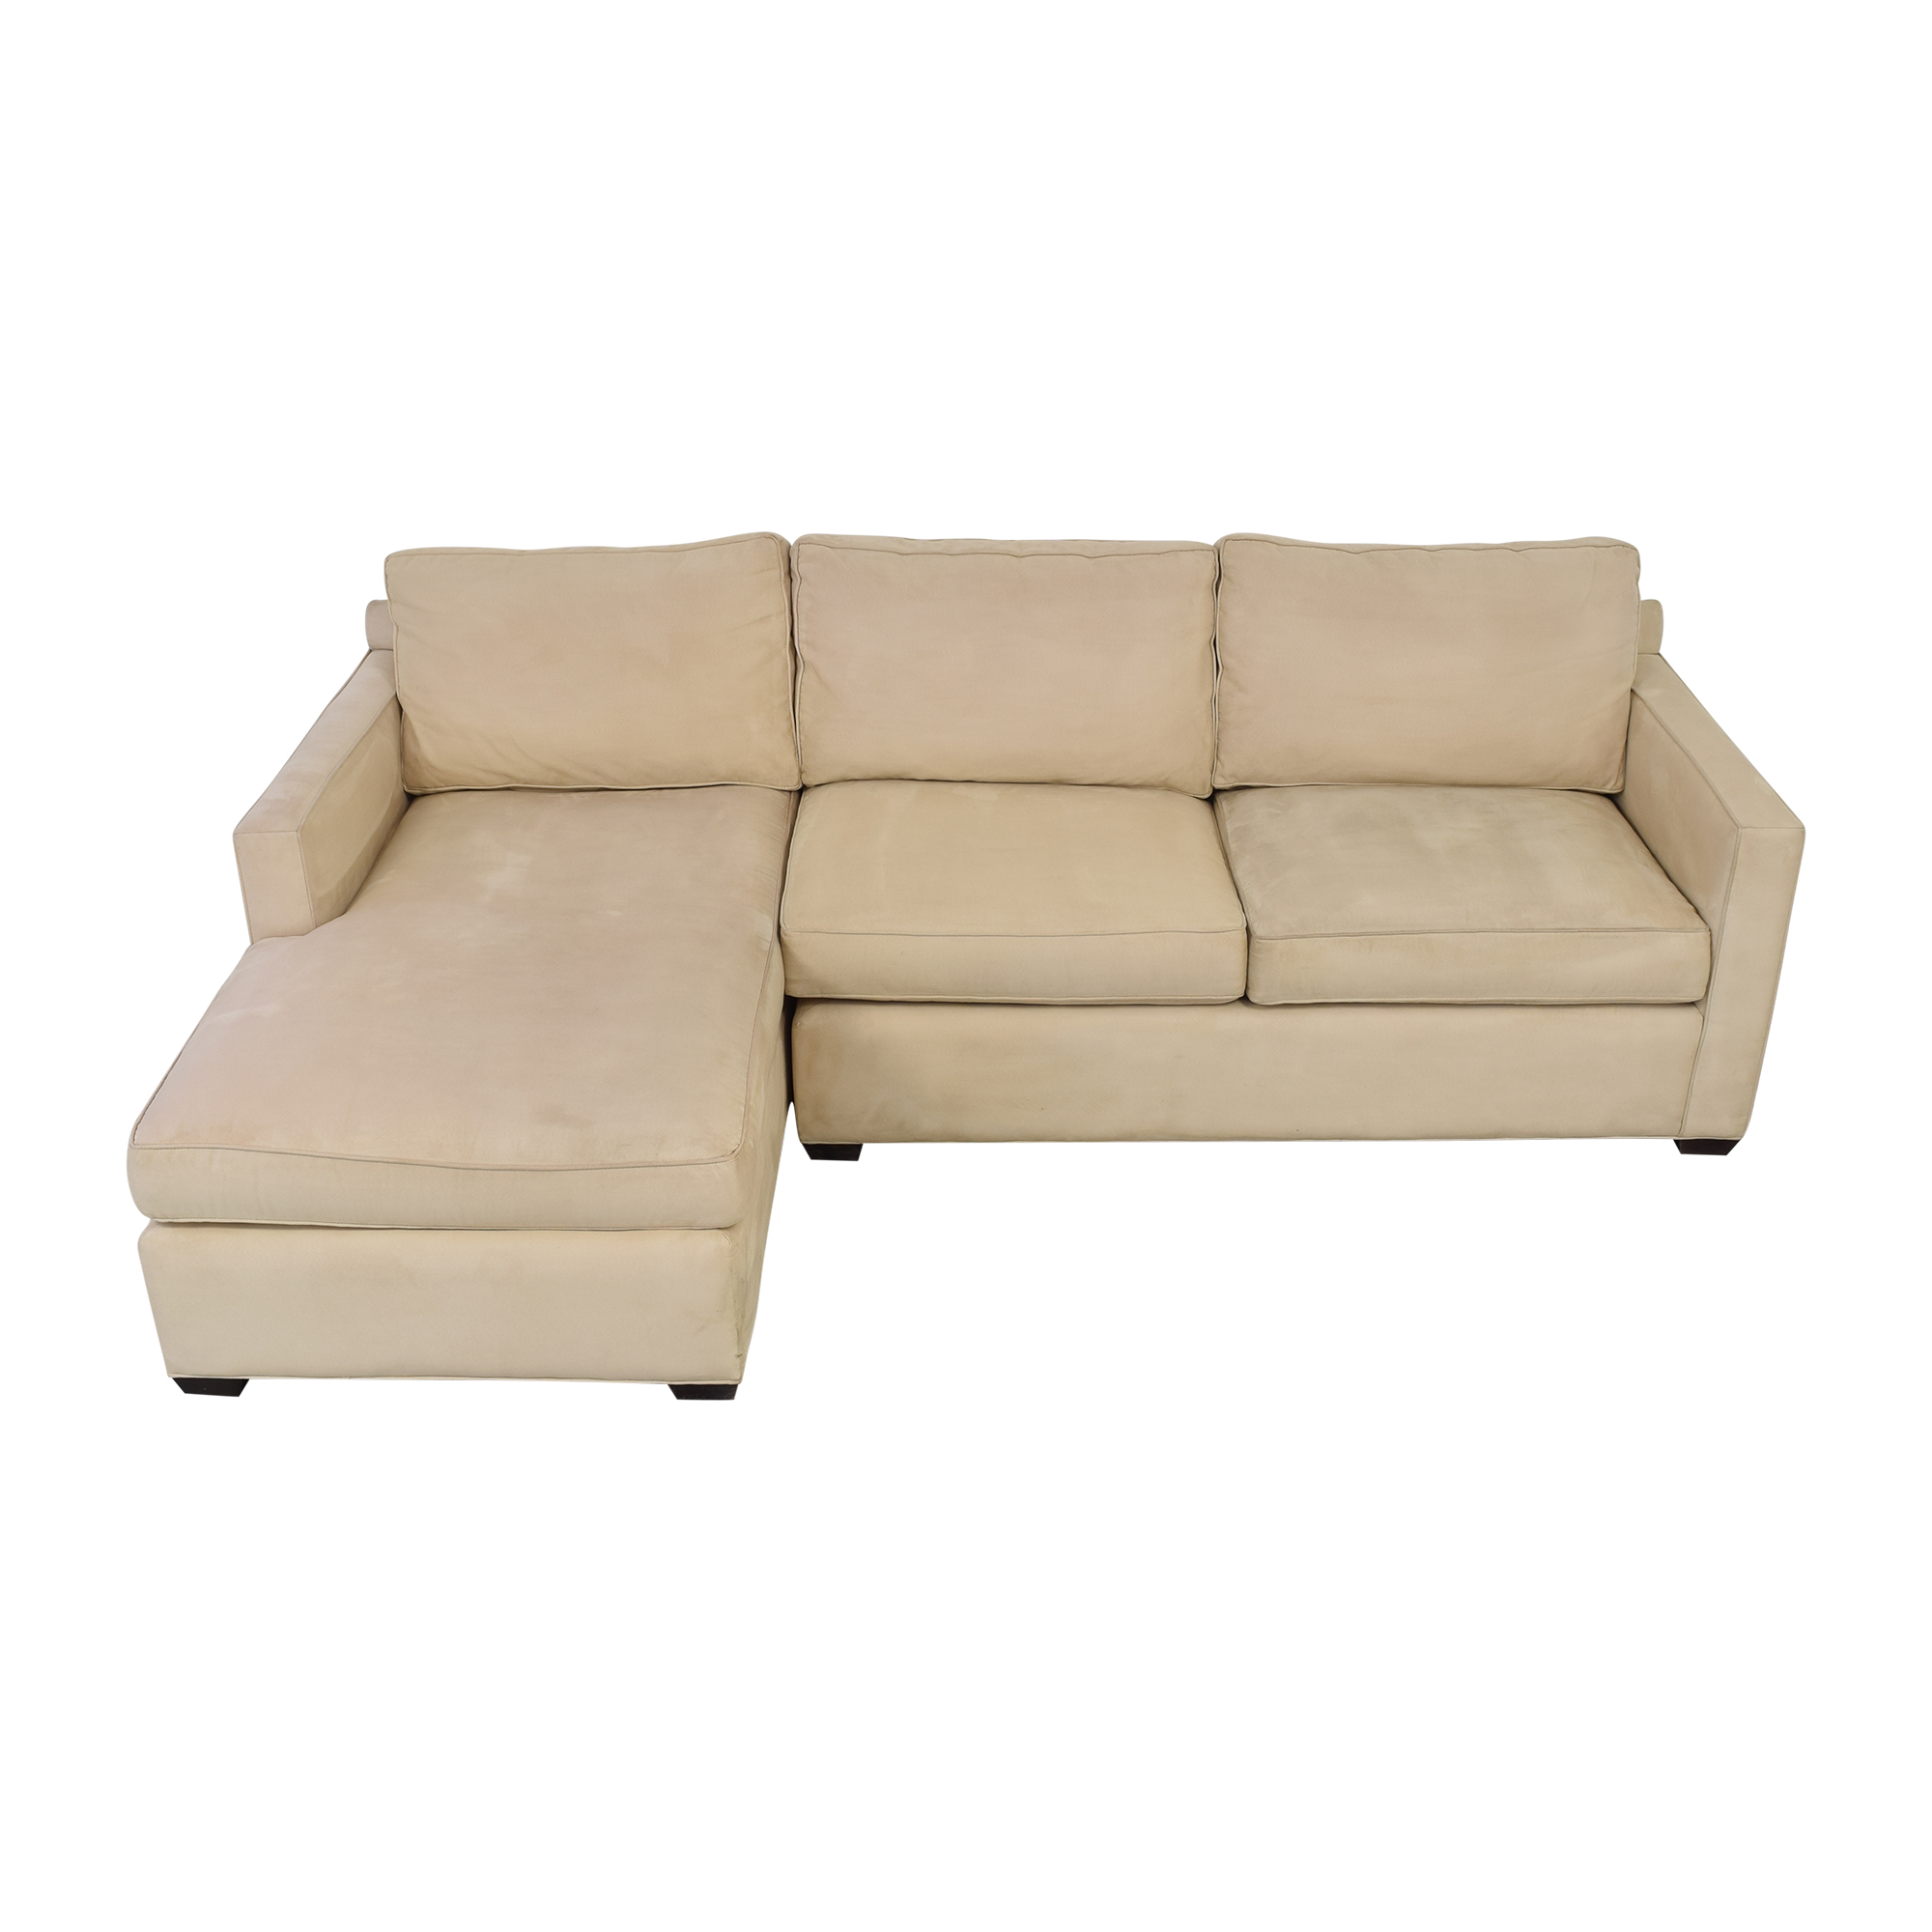 buy Crate & Barrel Crate & Barrel Davis Chaise Sectional Sofa online